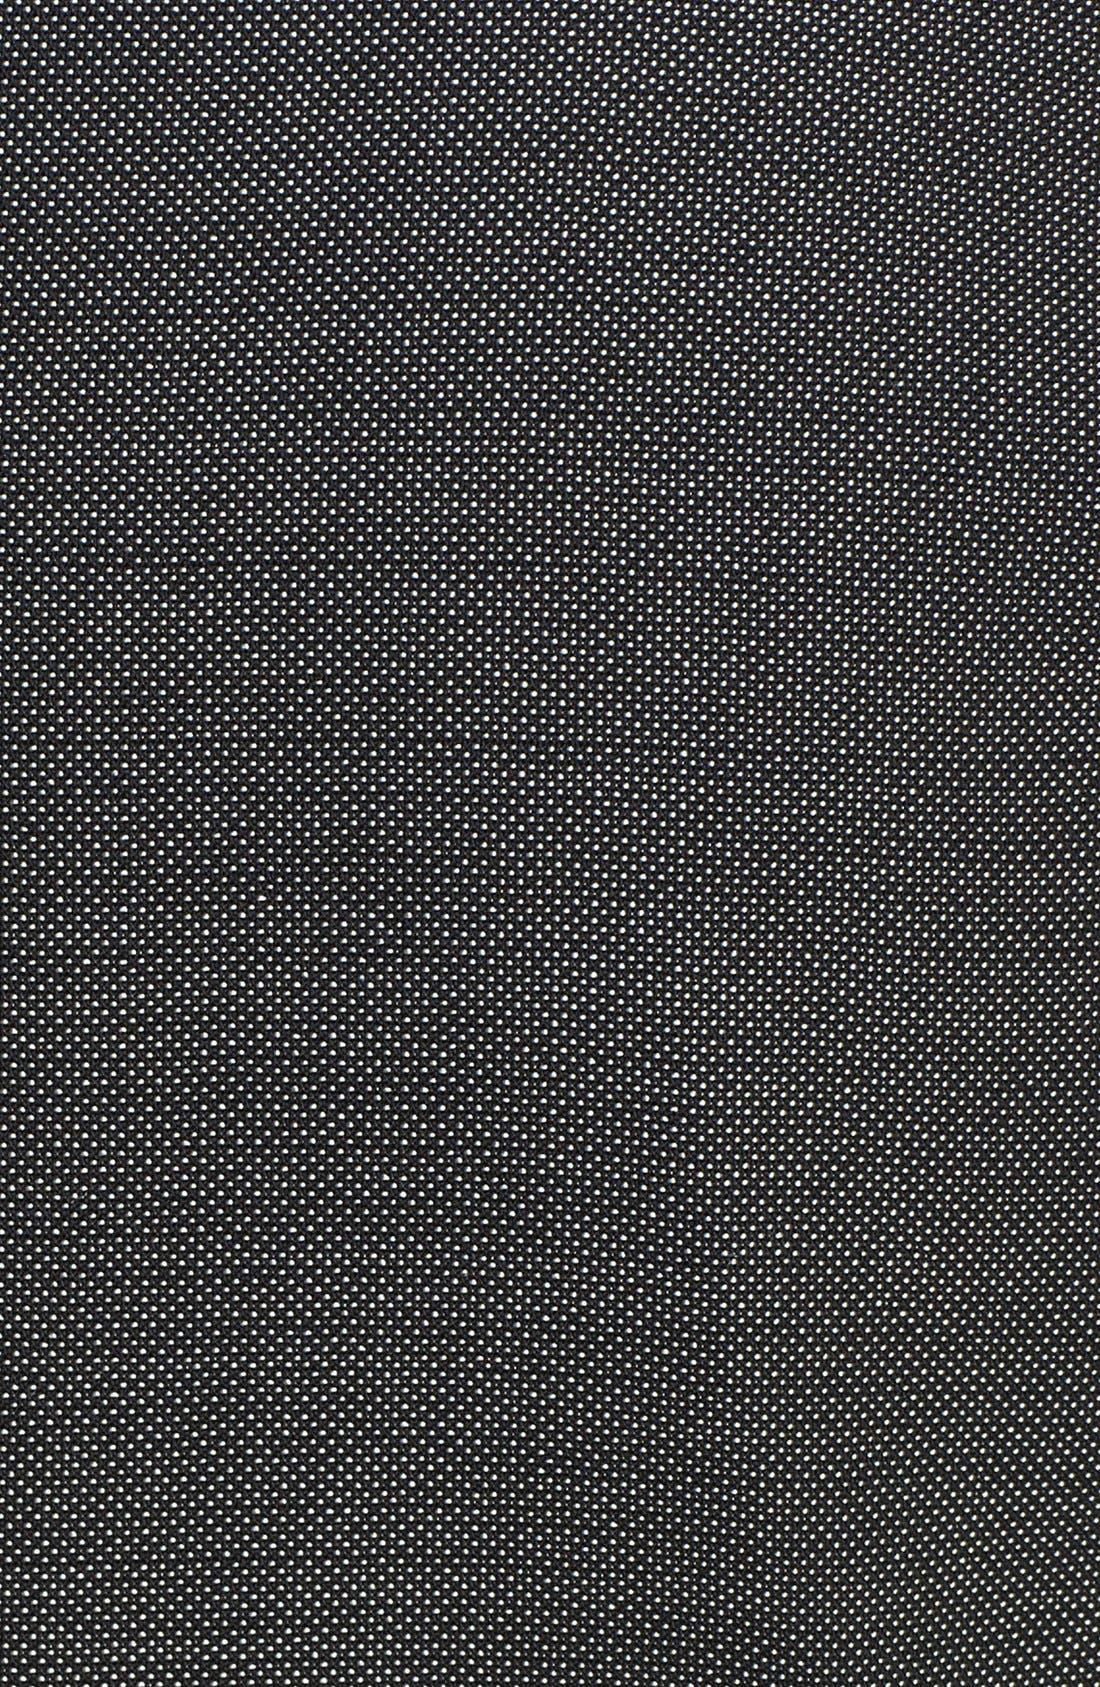 Alternate Image 3  - BOSS HUGO BOSS 'Jolisa' Stretch Wool Suiting Jacket